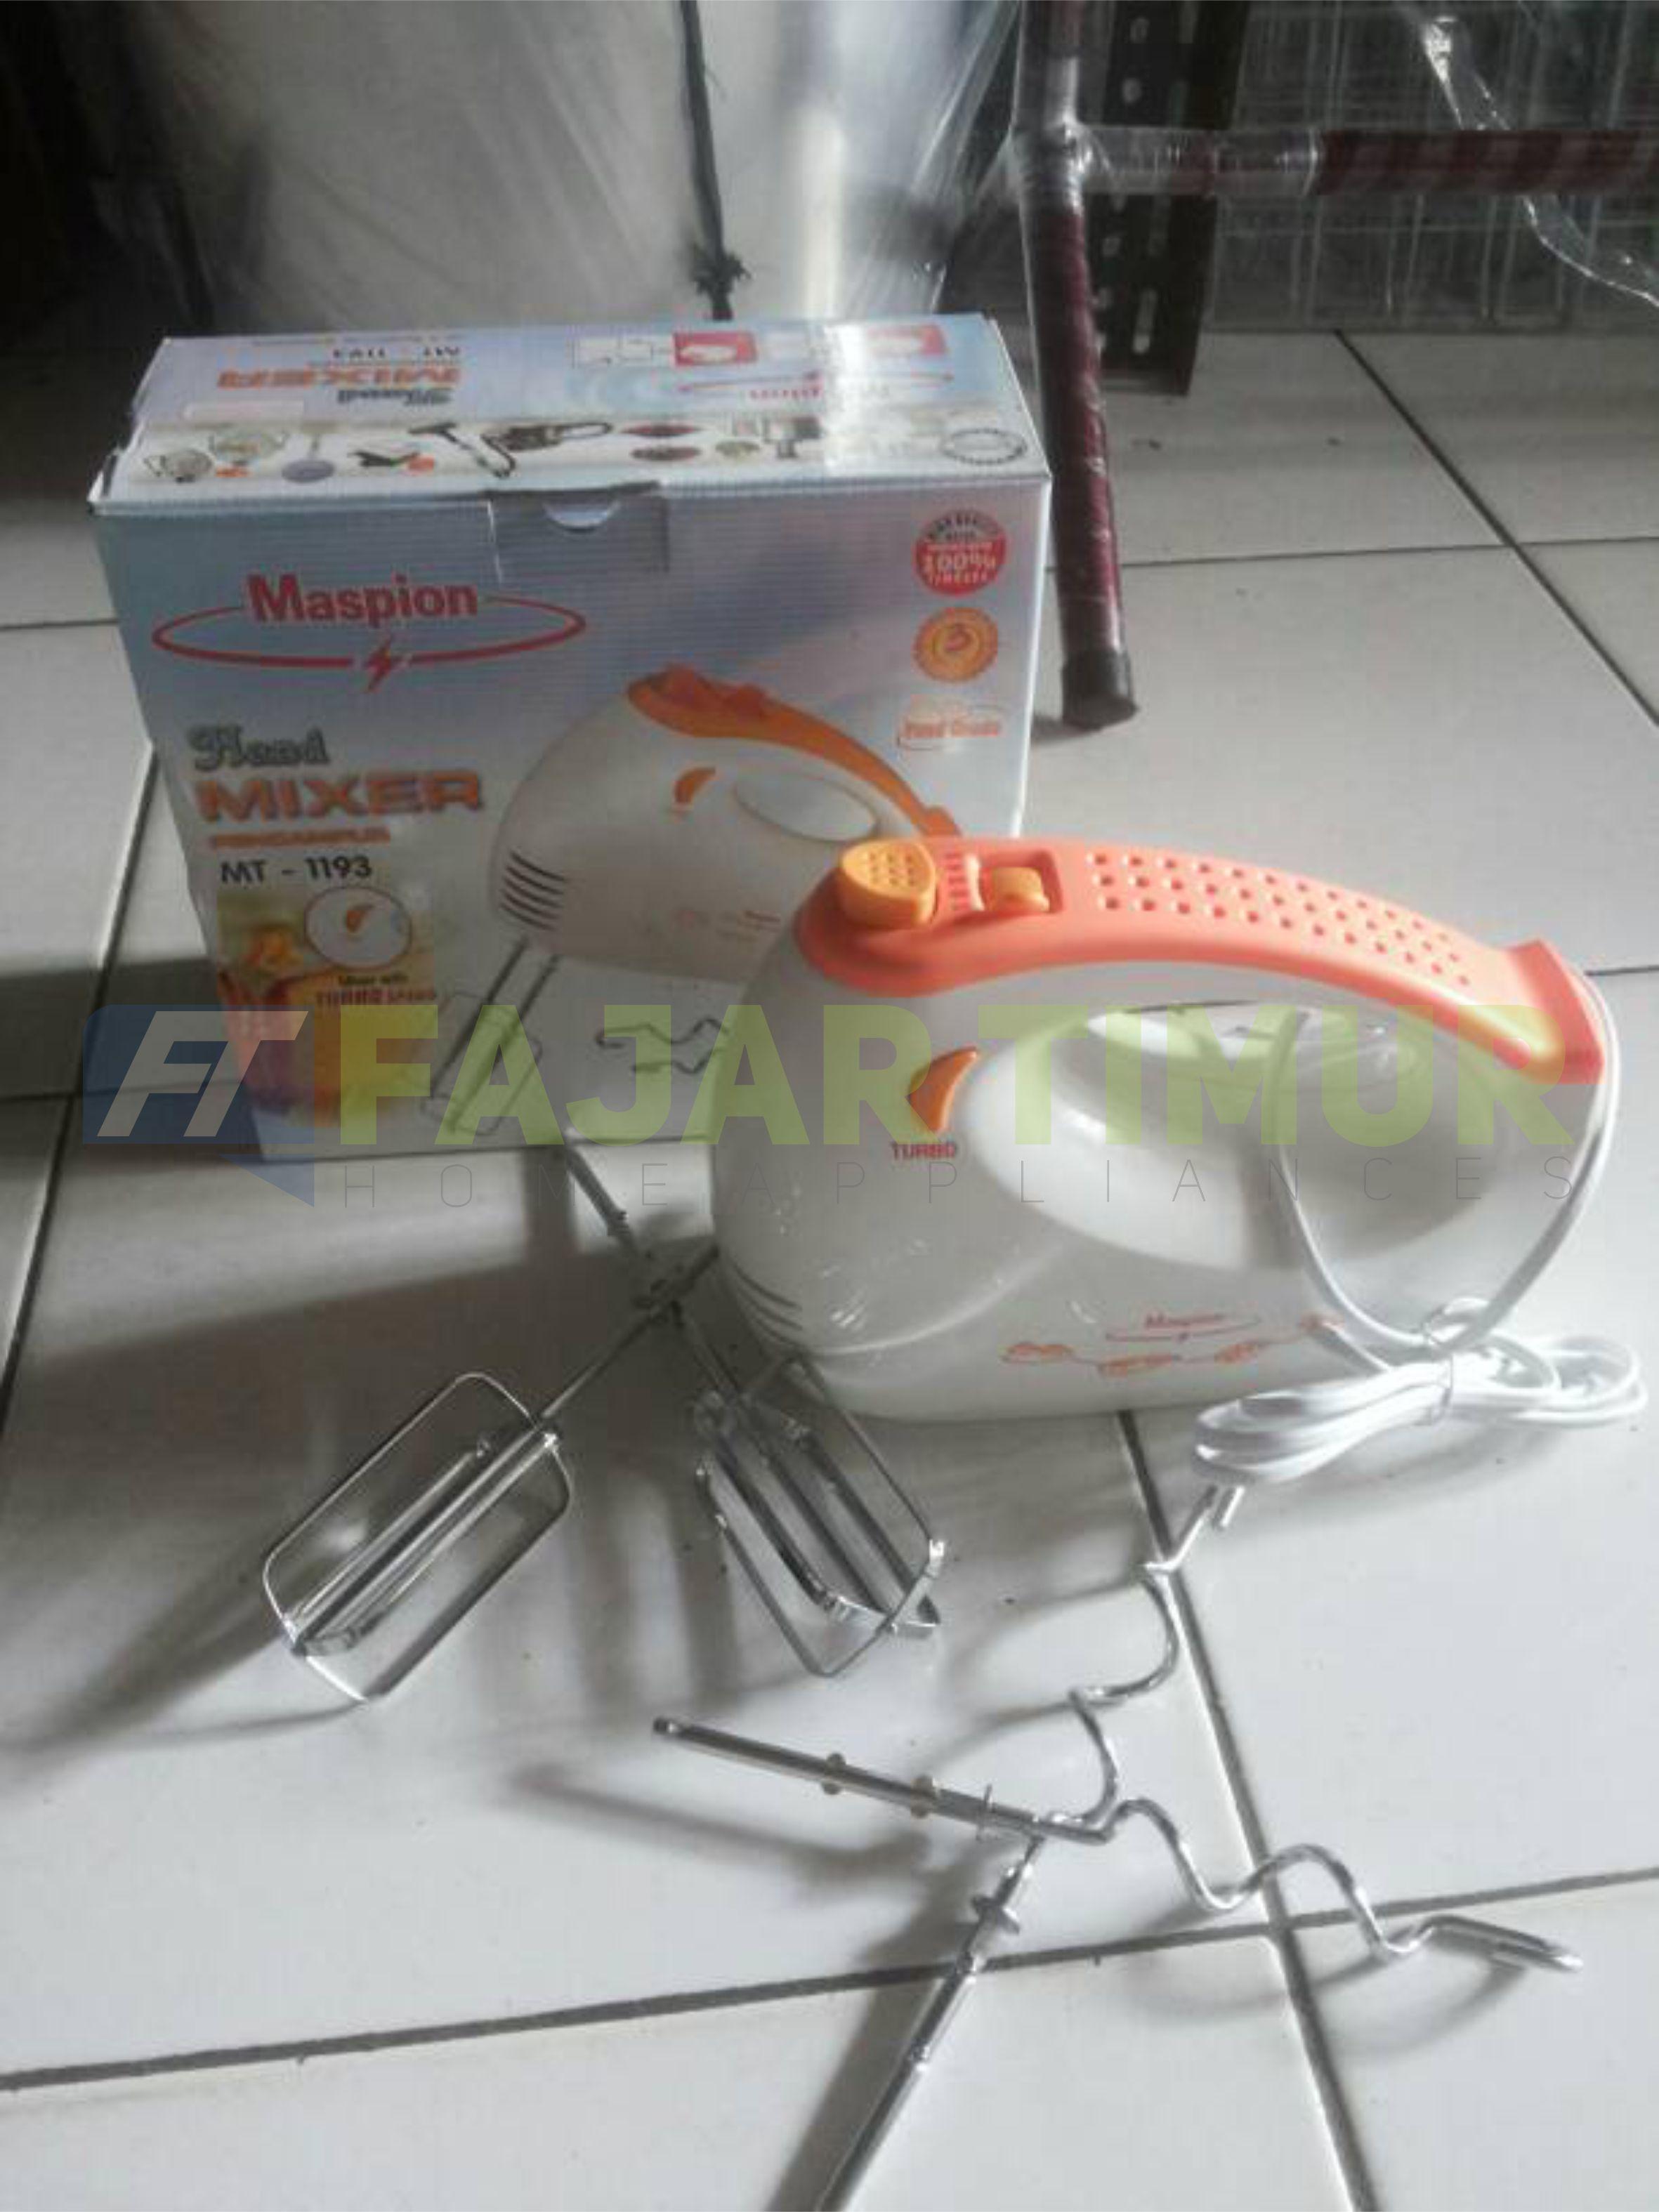 Mixer Hand Maspion Mt 1193 Fajartimur Blender 1206 Spesifikasi